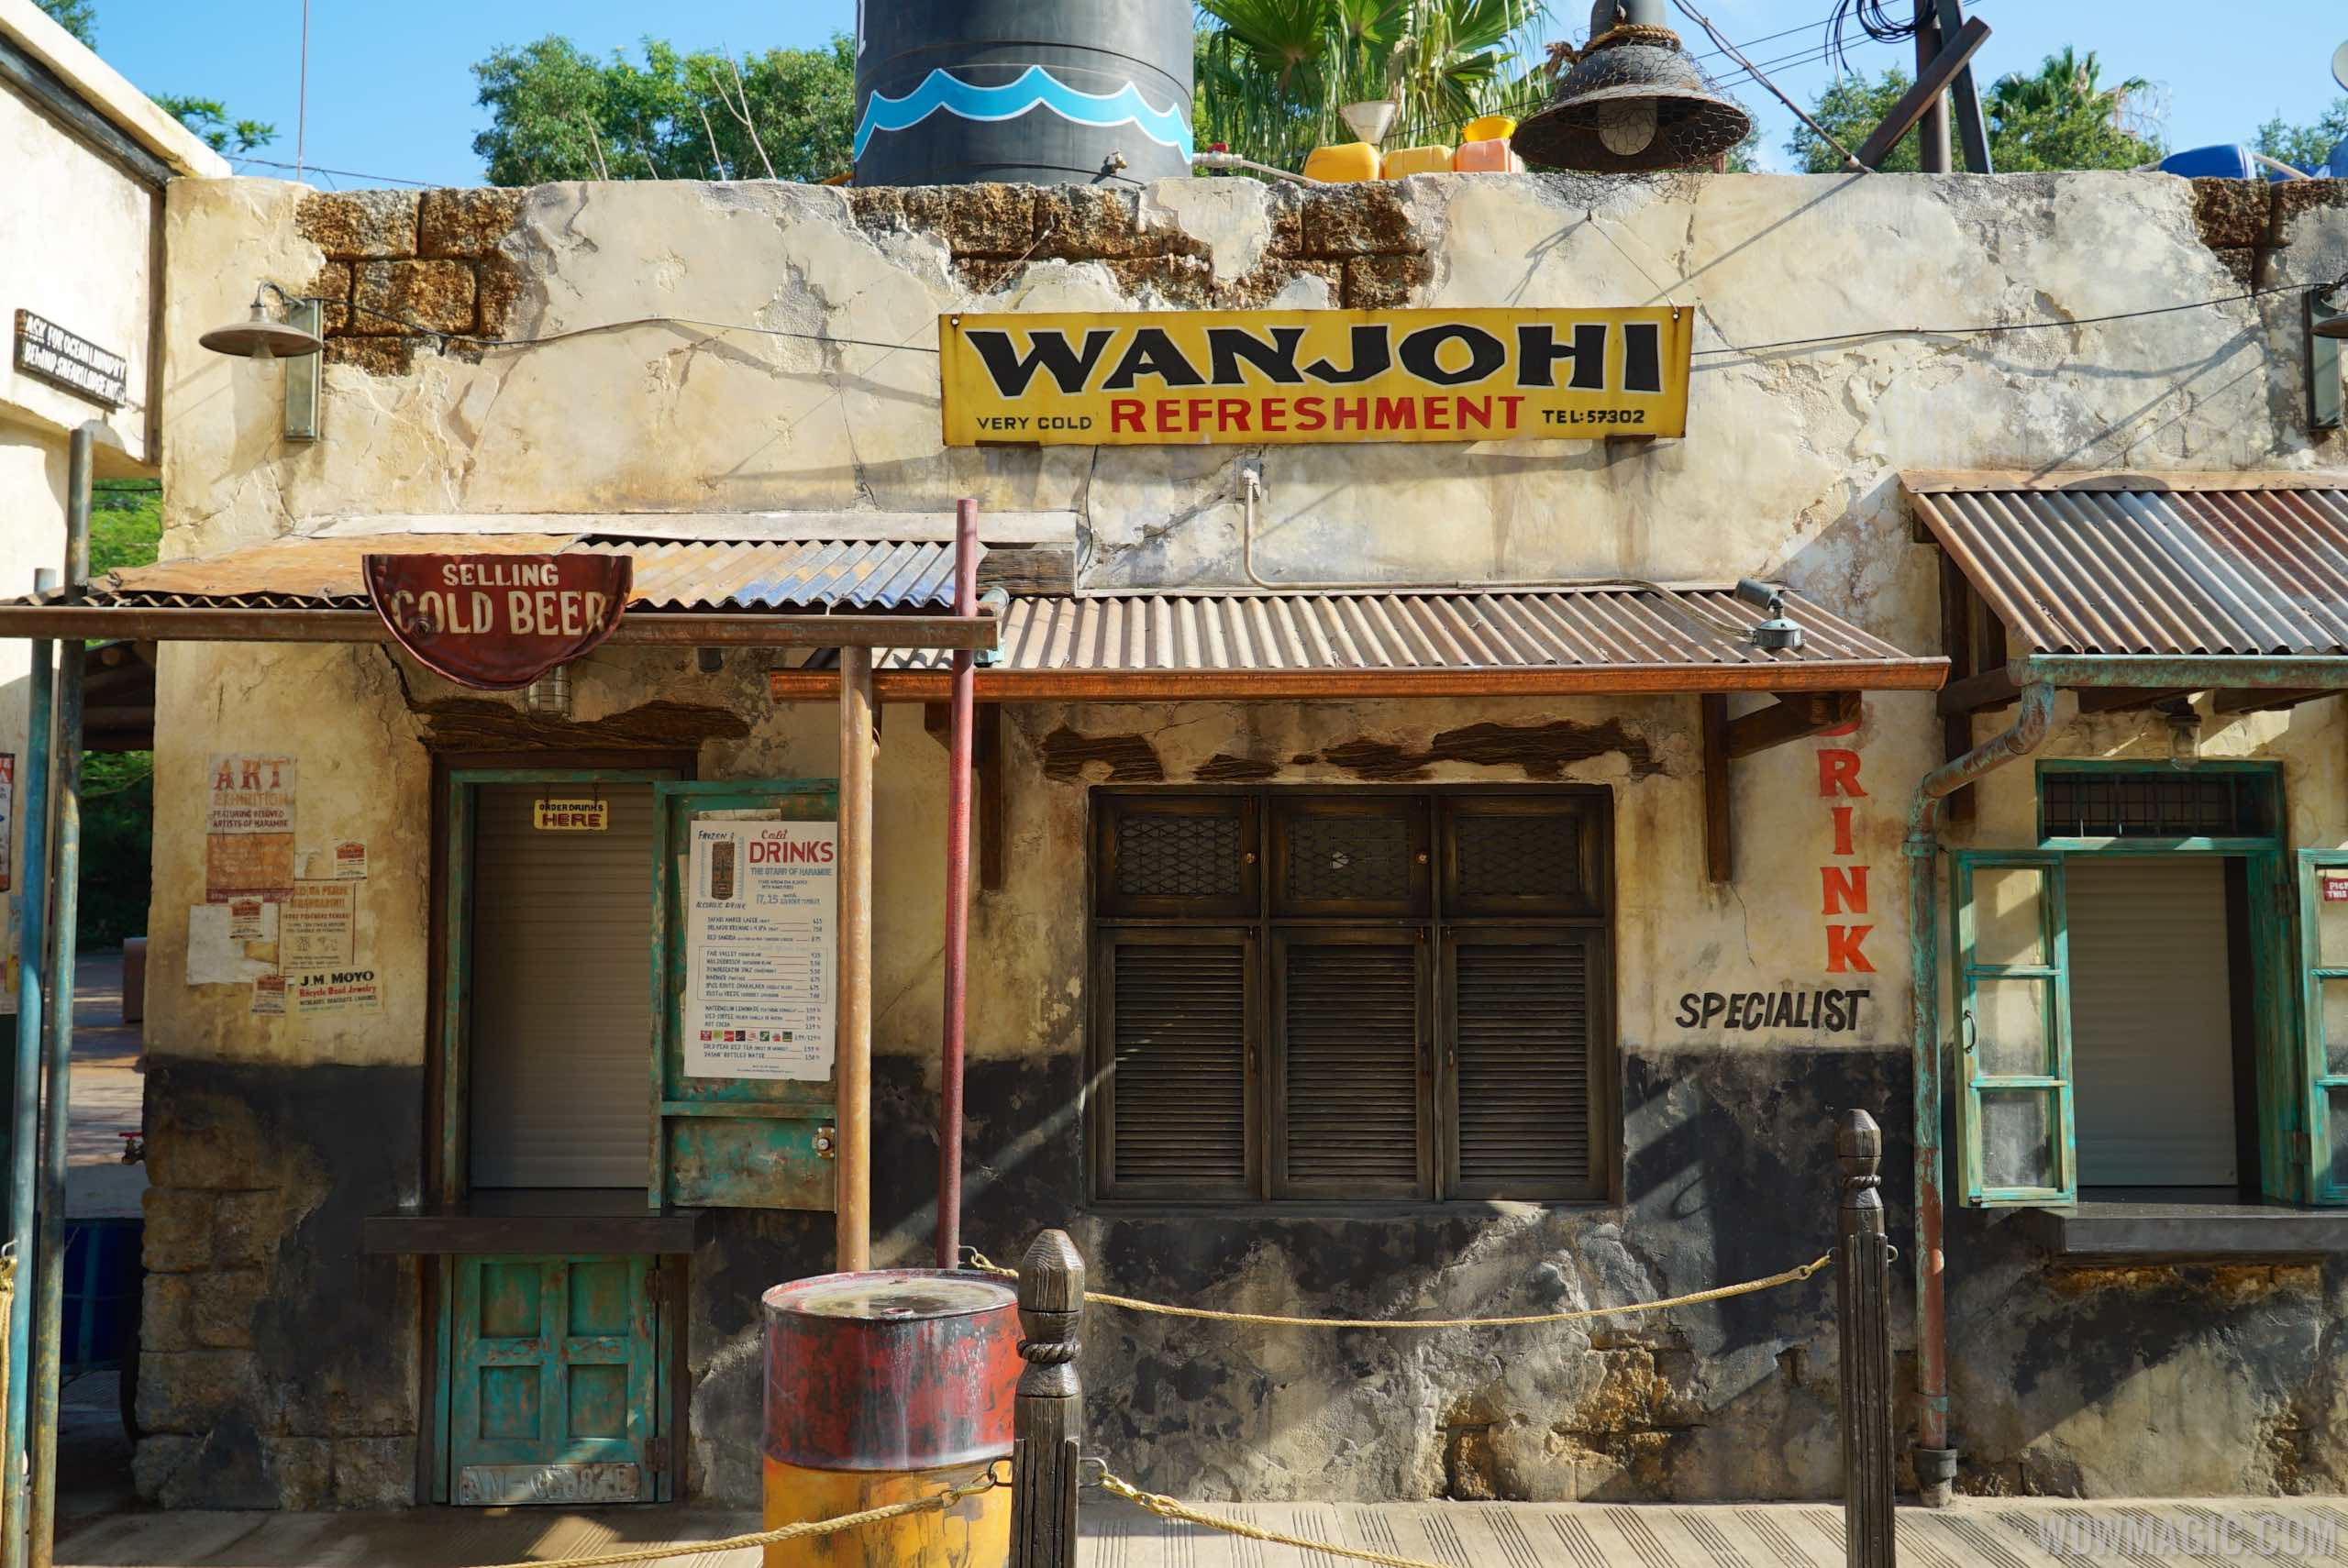 Harambe Market - Wanjohi Refreshment